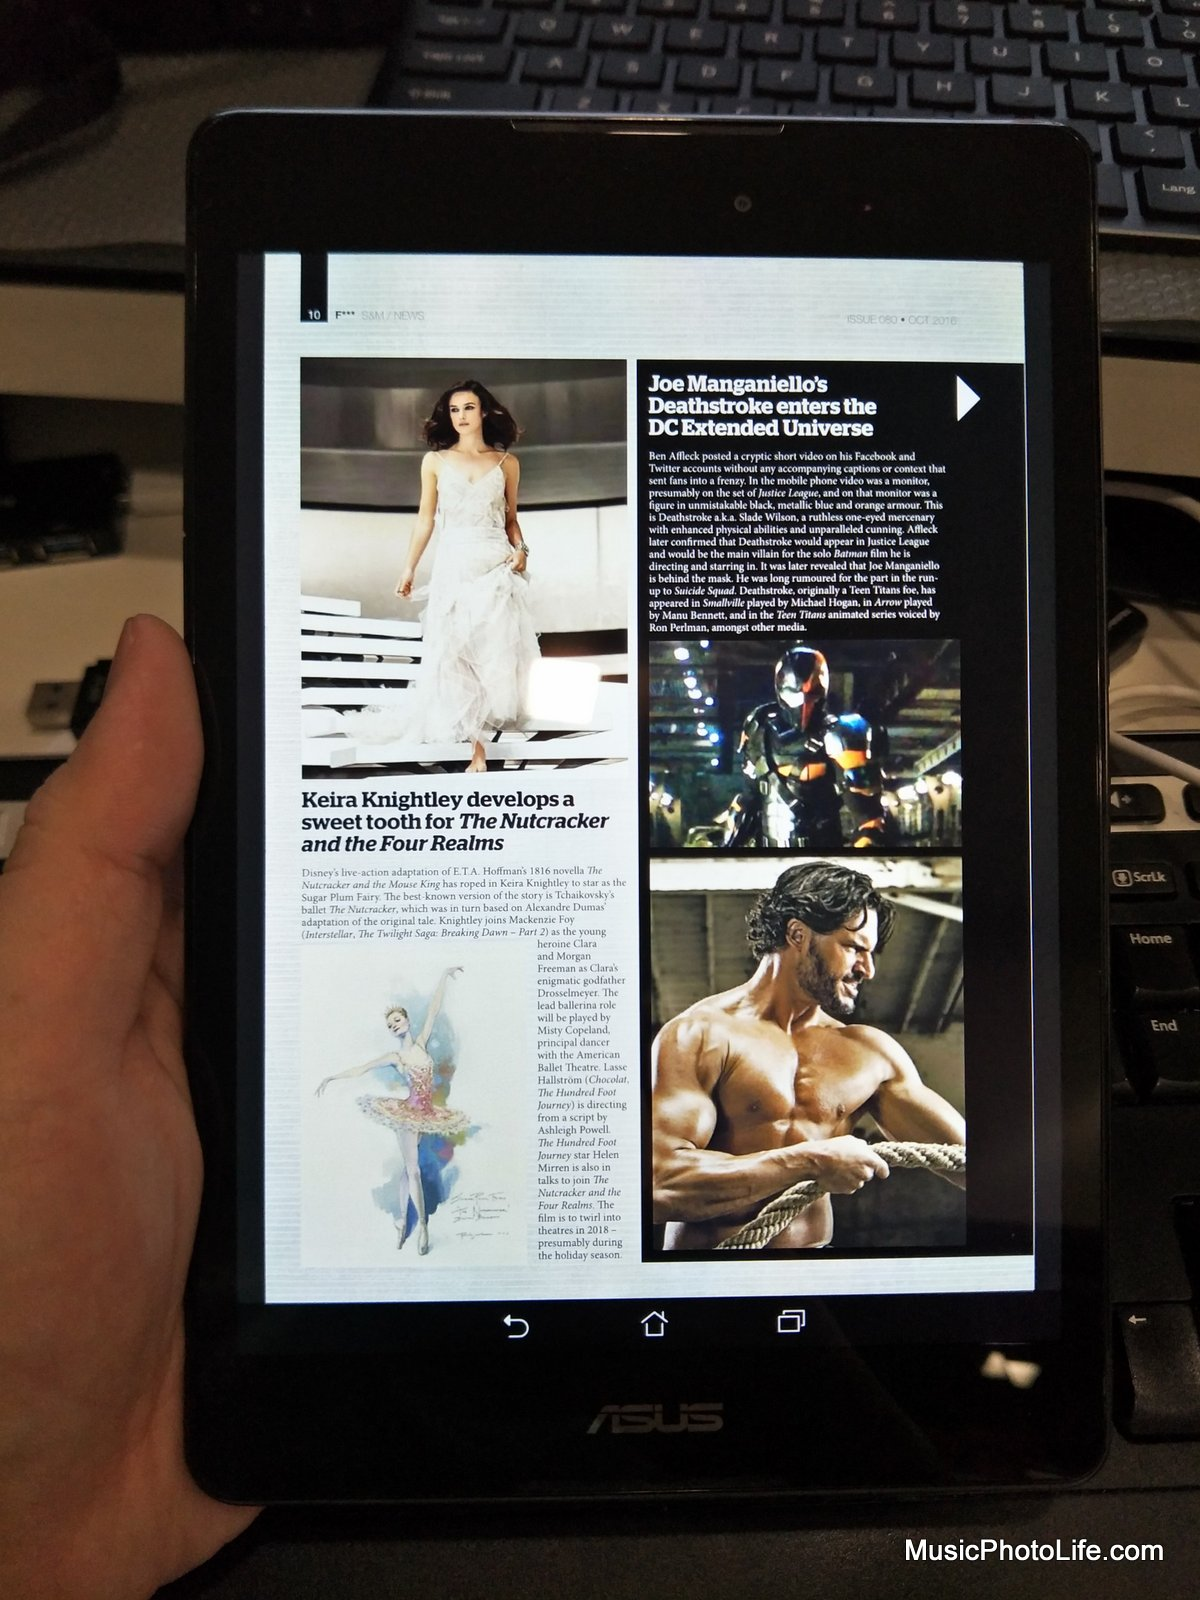 ASUS ZenPad 3 review by musicphotolife.com